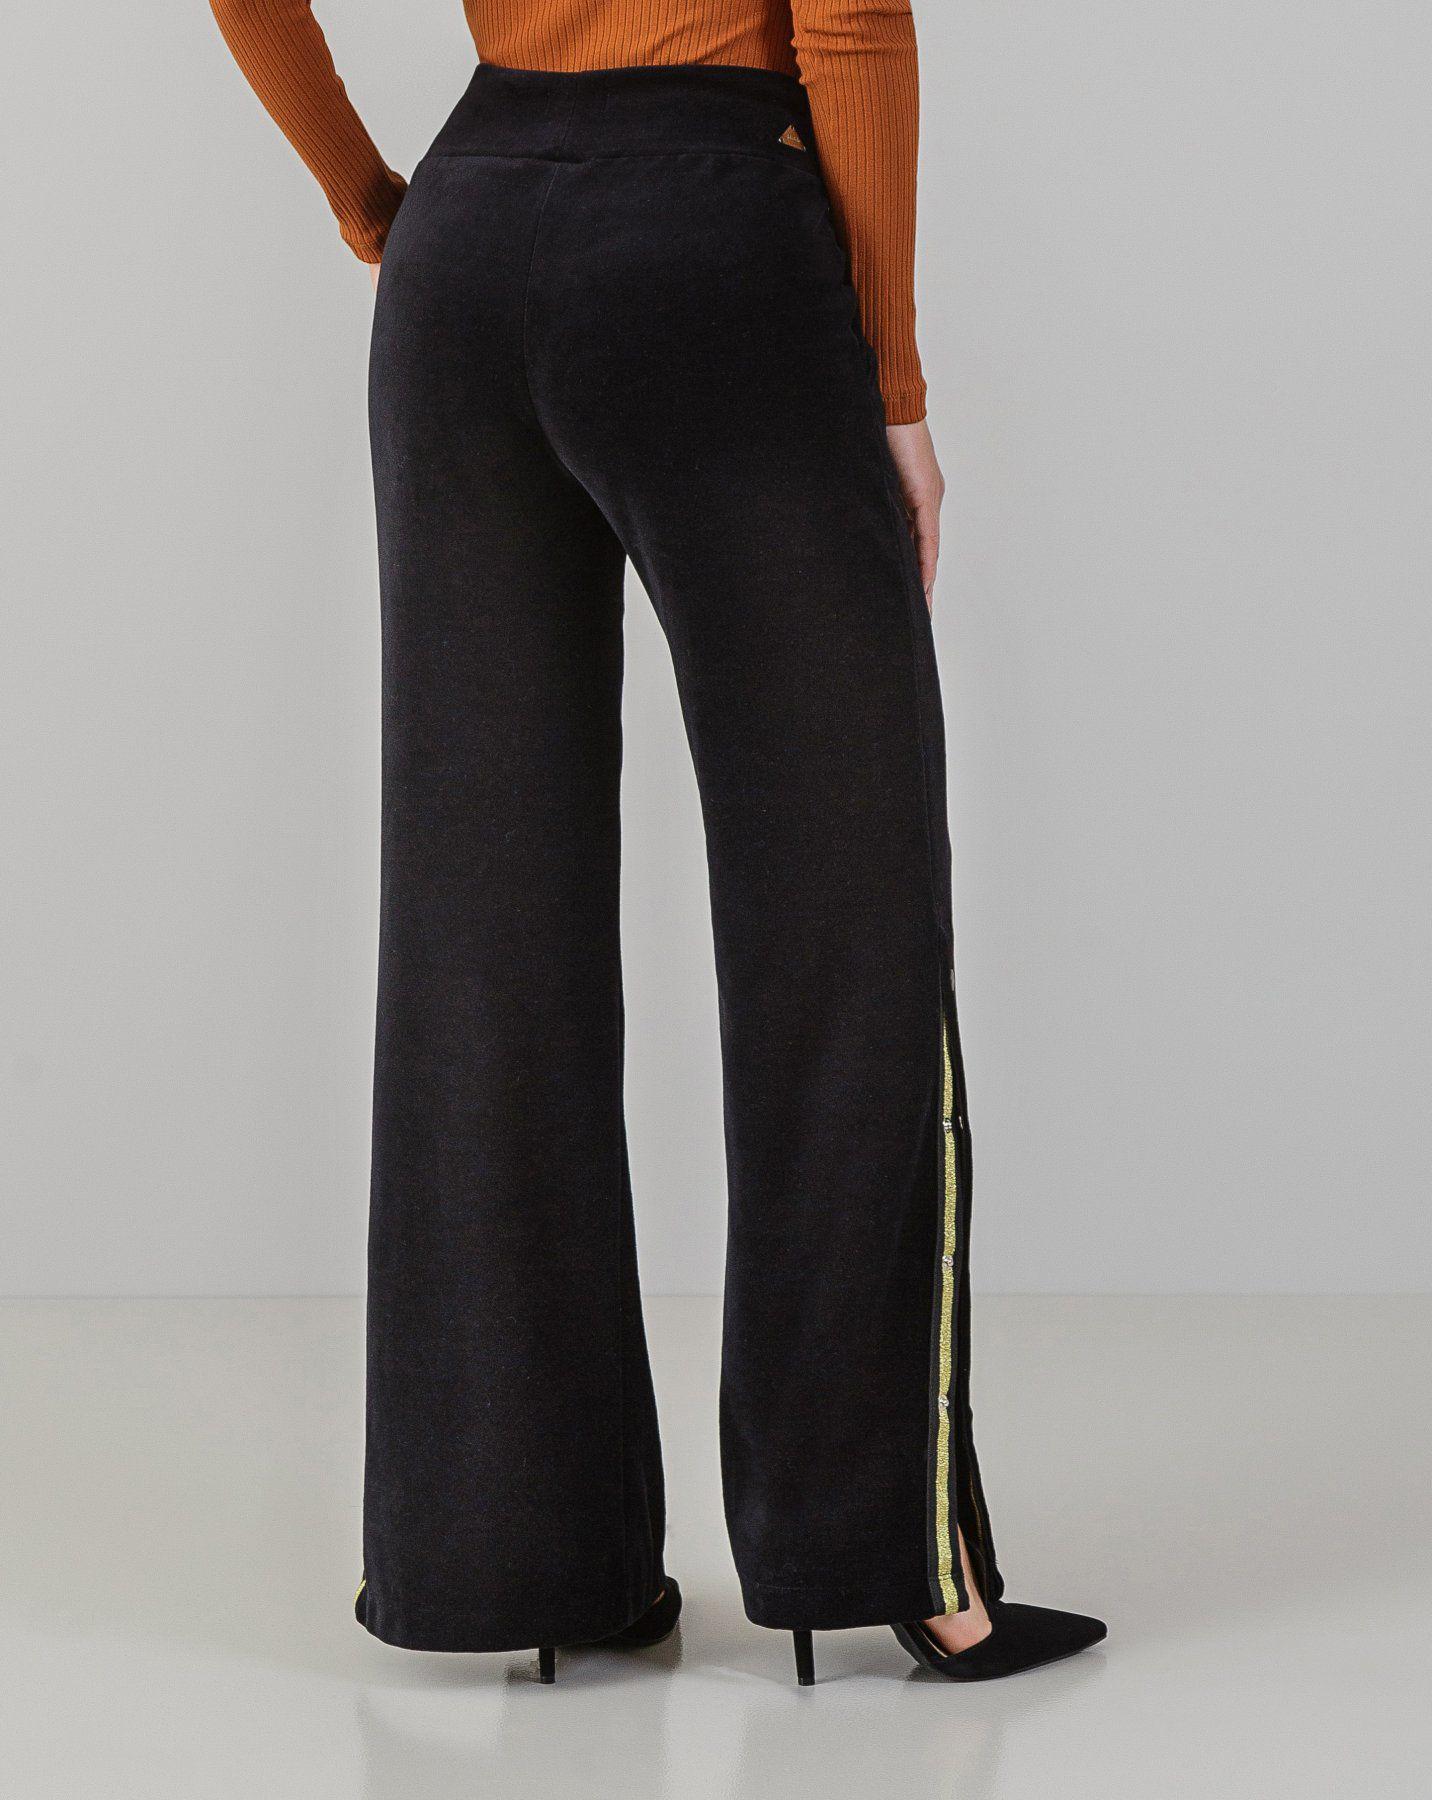 Calça Plush Pantalona